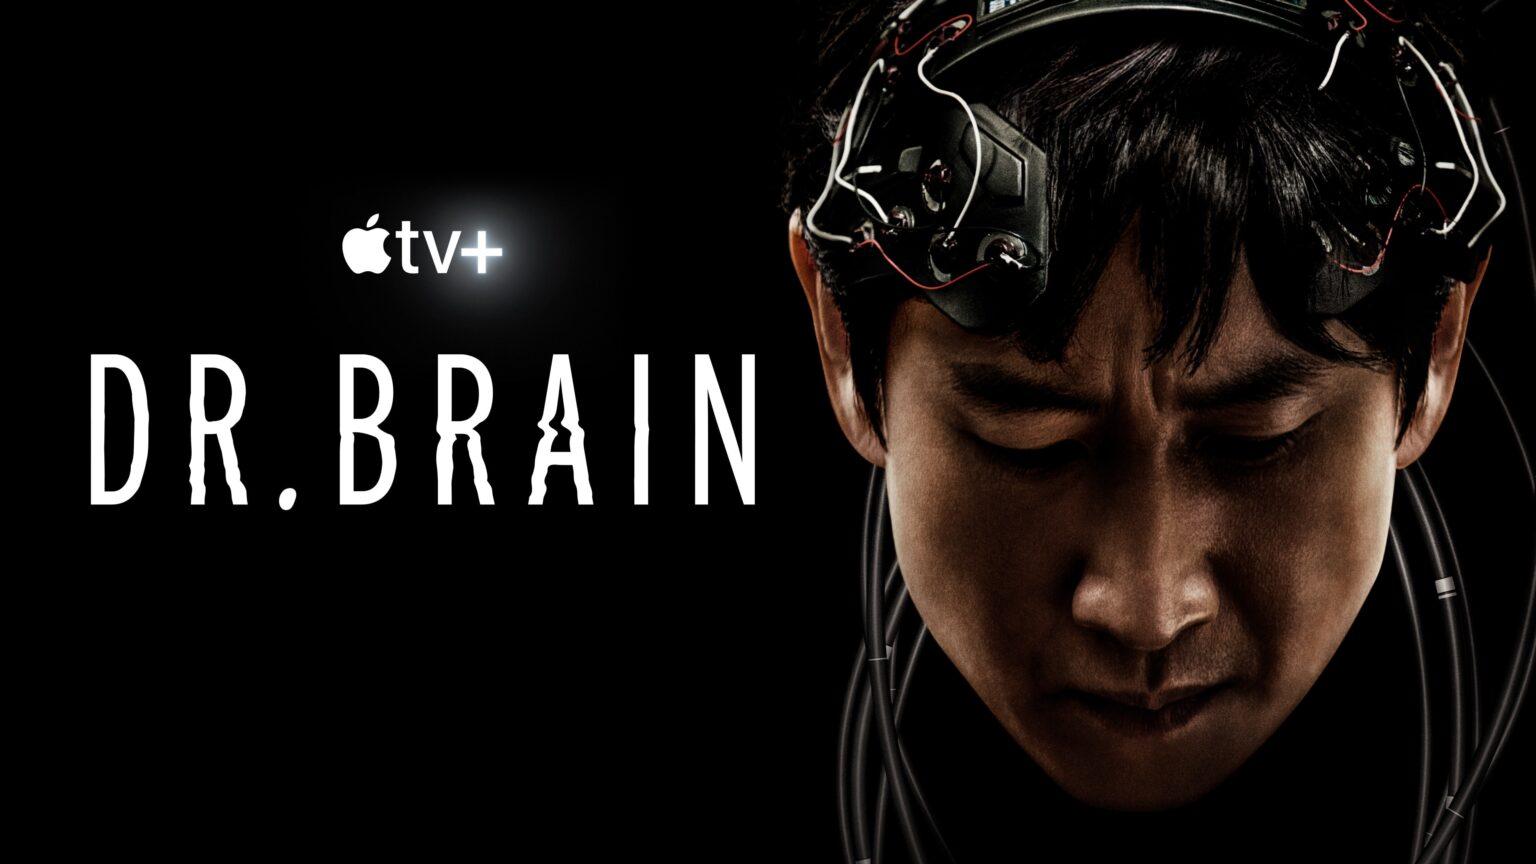 Intense 'Dr. Brain' sci-fi K-drama hits Apple TV+ on Nov. 4